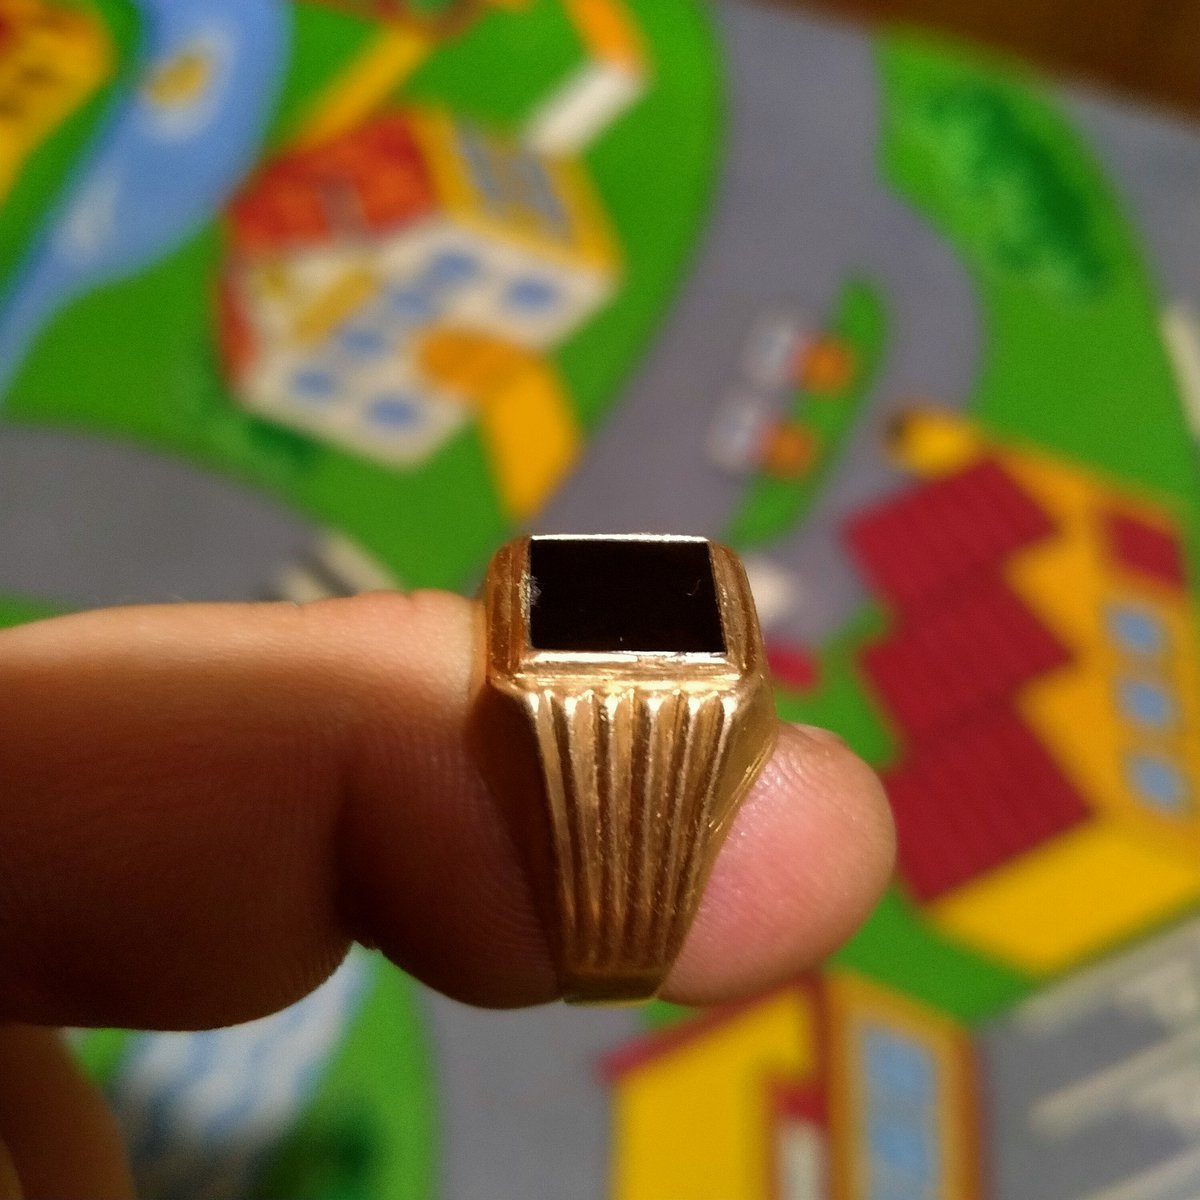 Кольцо с орлом.